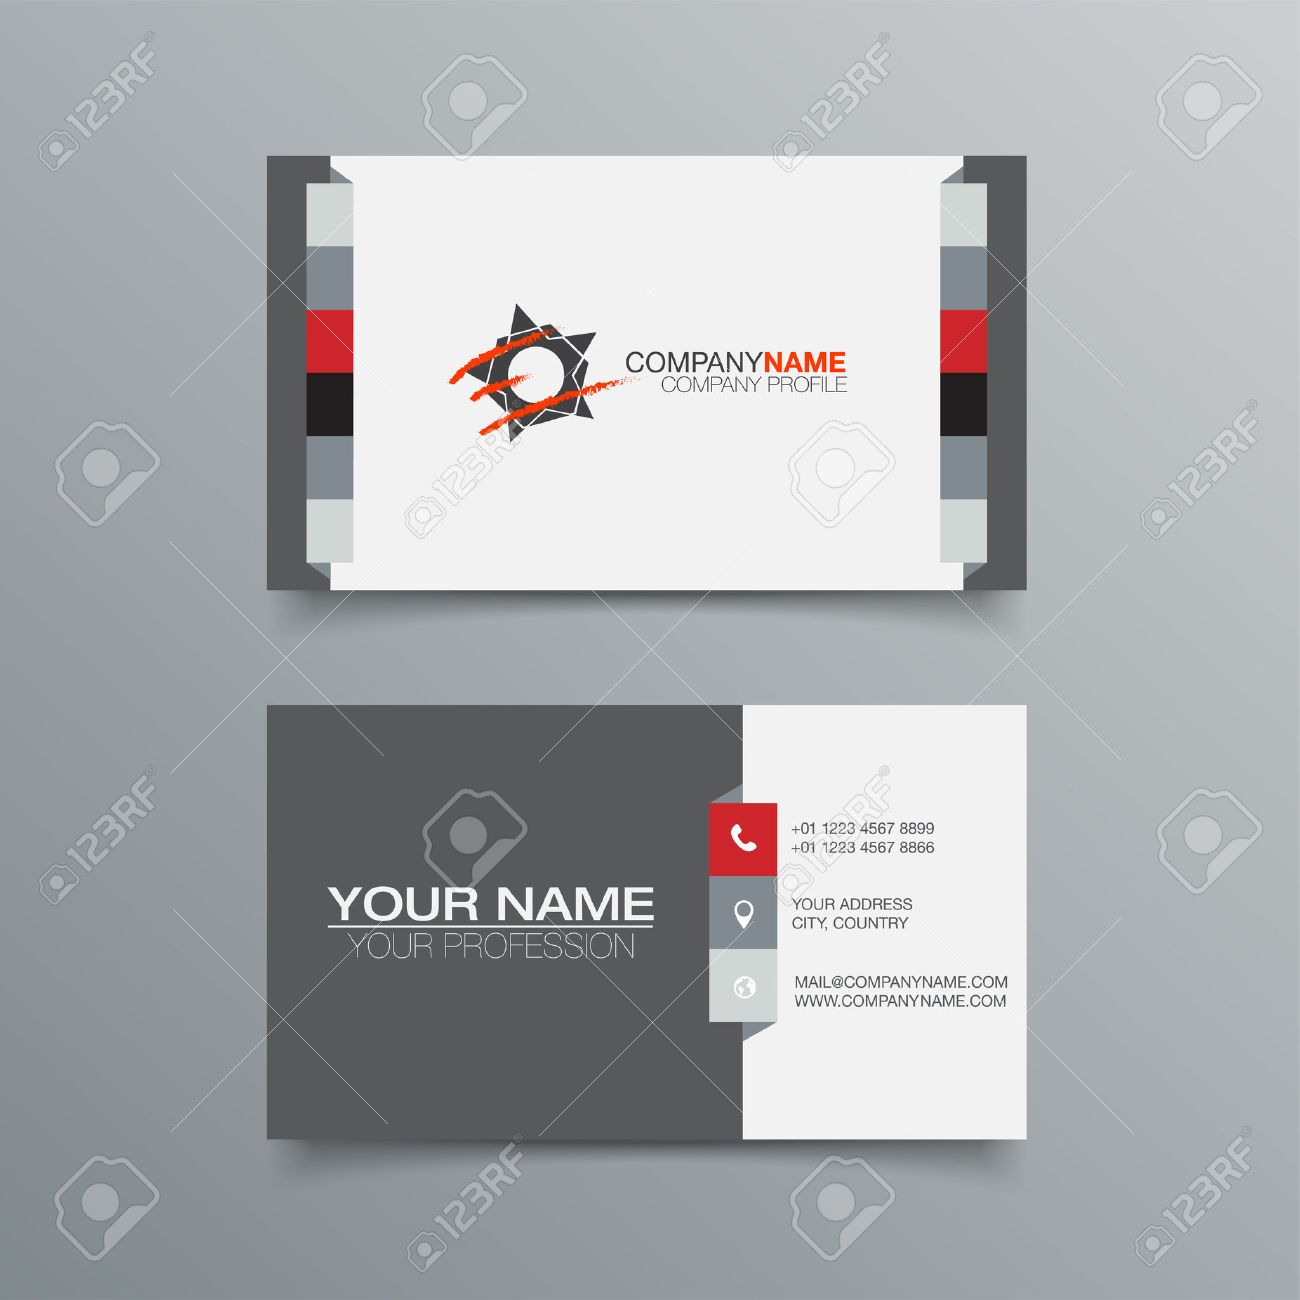 Business Card Background Design Template. Stock Vector Illustration - 43934307